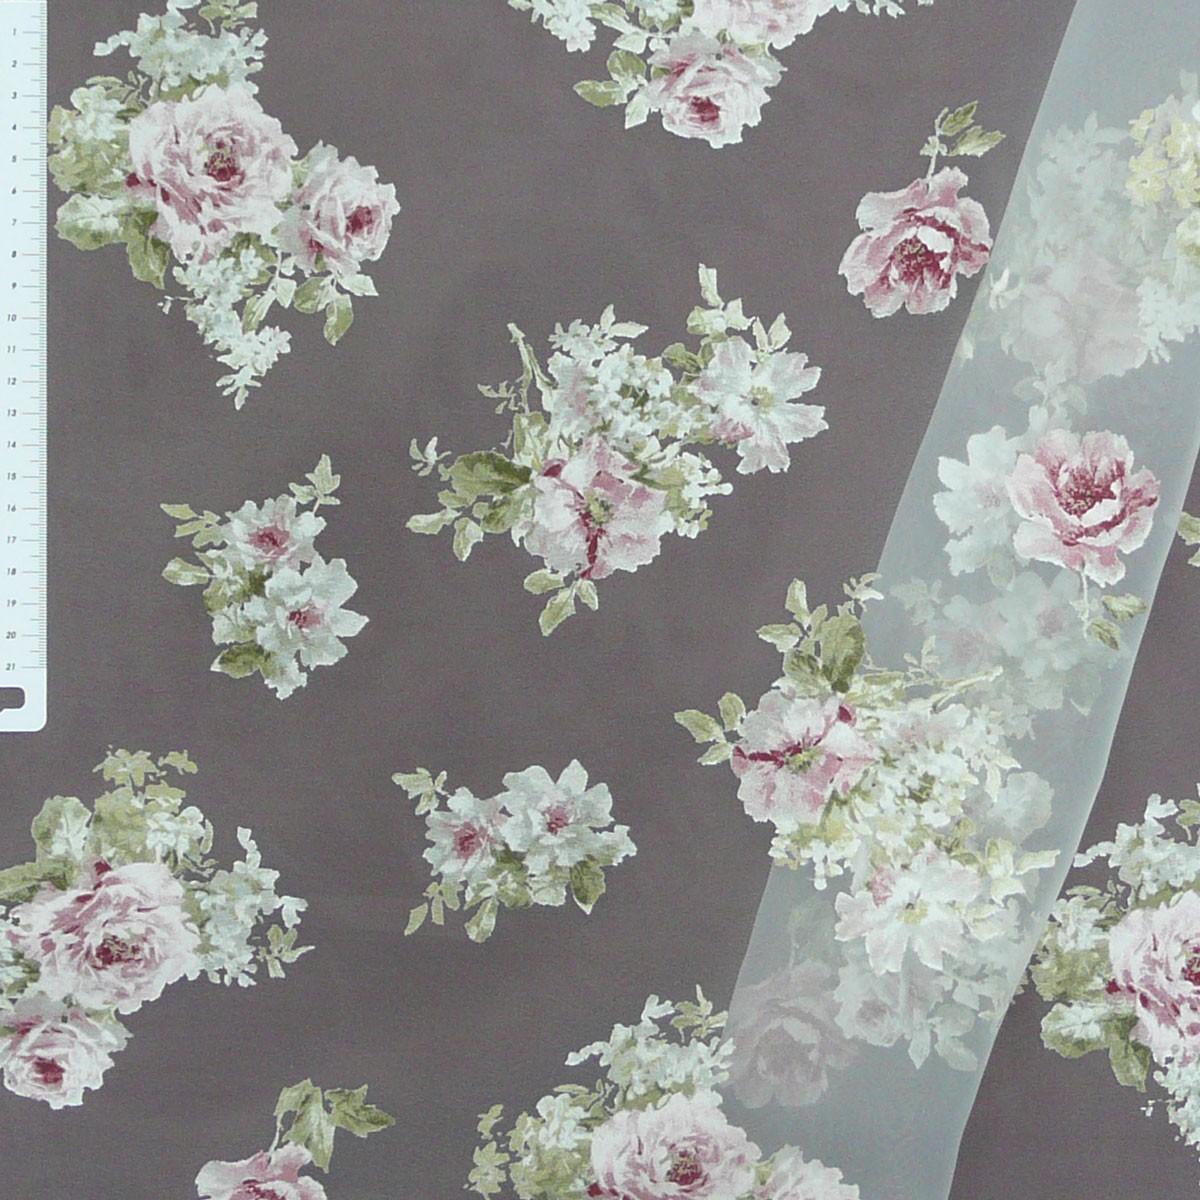 organza rose rosen gardinenstoff stoff dekostoff 2 8m h he stoffe stoffe gemustert stoff blumen. Black Bedroom Furniture Sets. Home Design Ideas